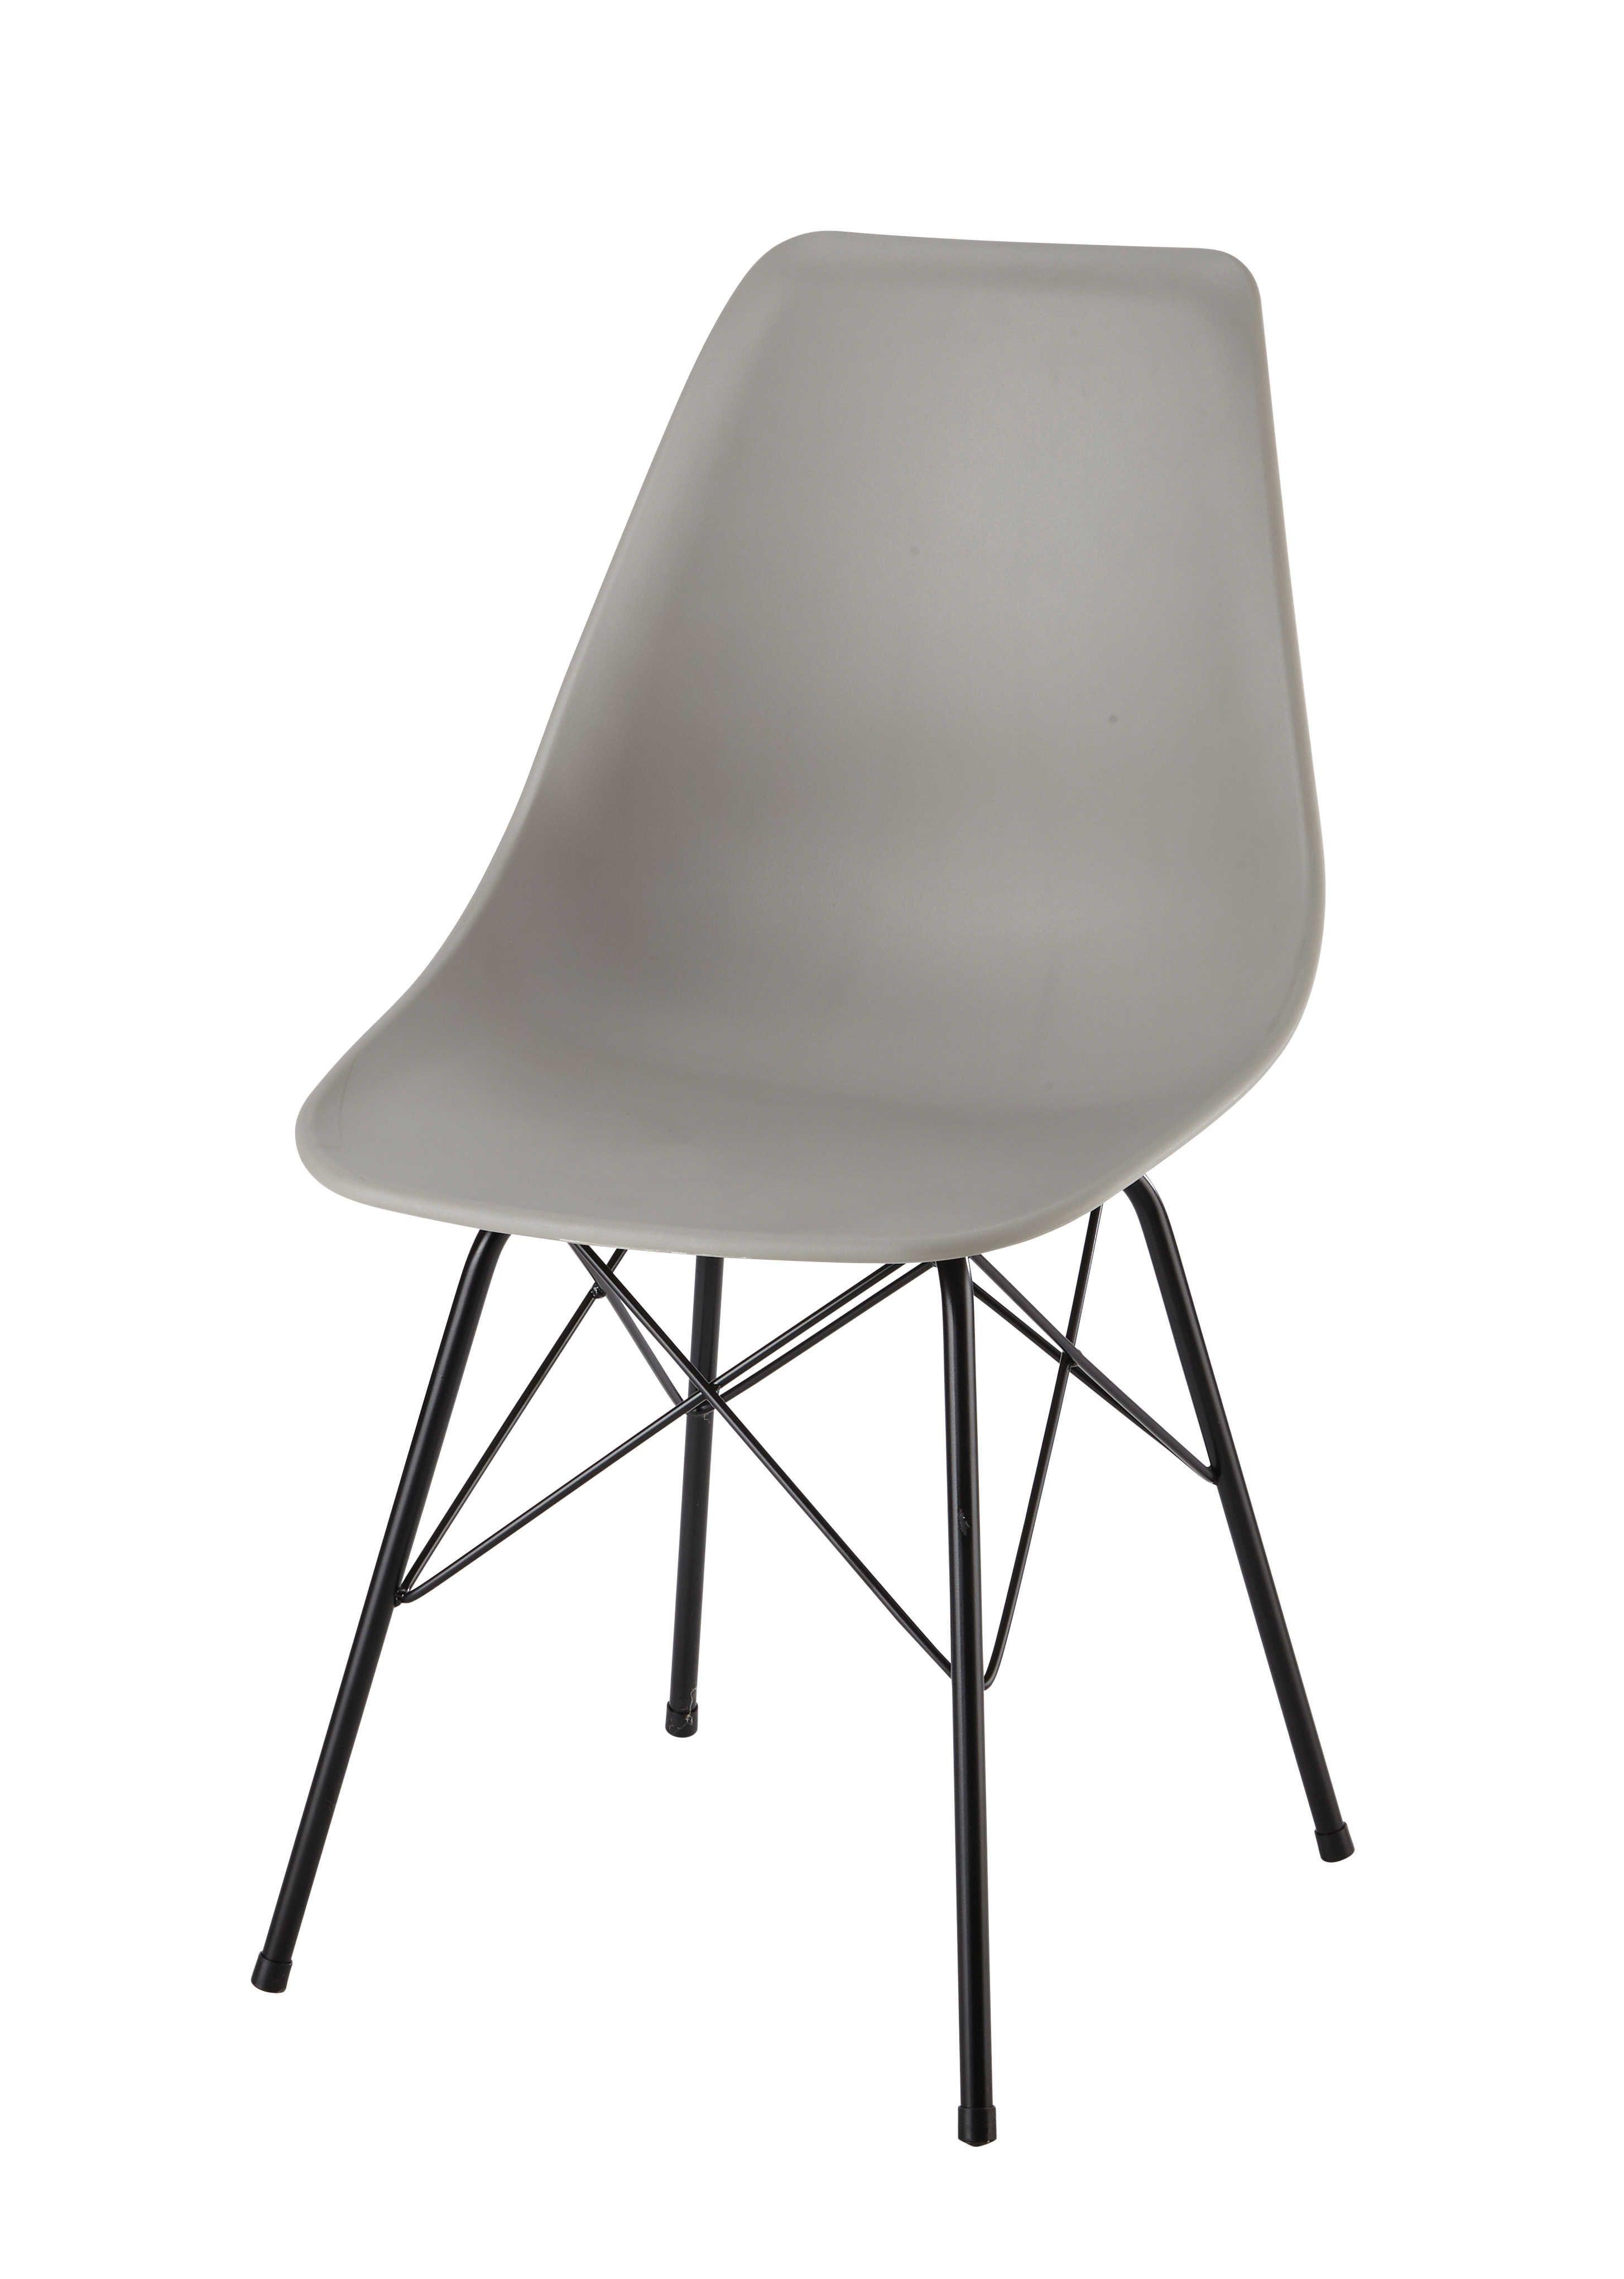 Stuhl aus Polypropylen und Metall, hellgrau Cardiff | Inspiration ...